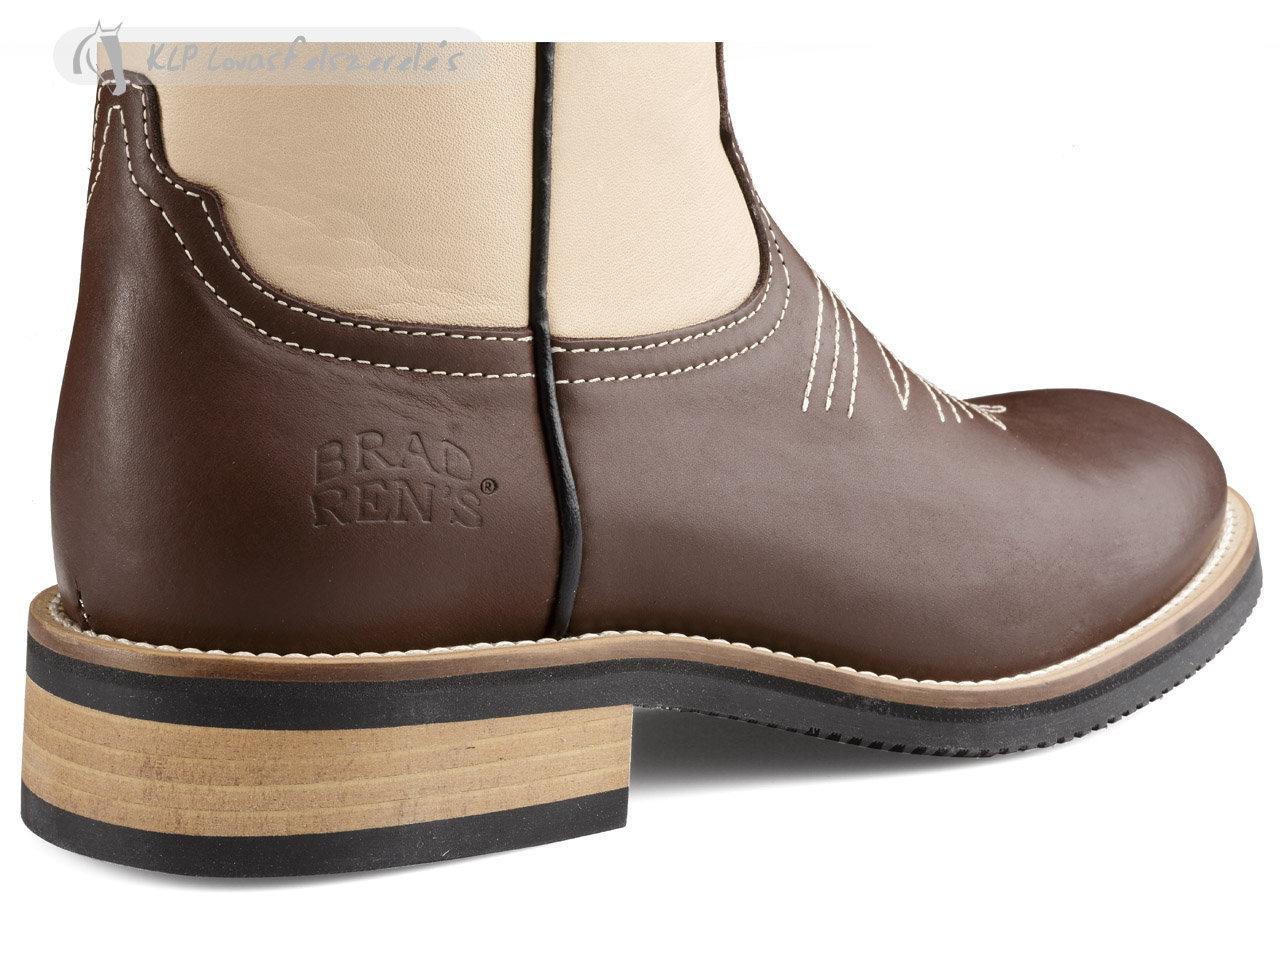 Brad Ren S Western Boots Avalanche c031905a1b